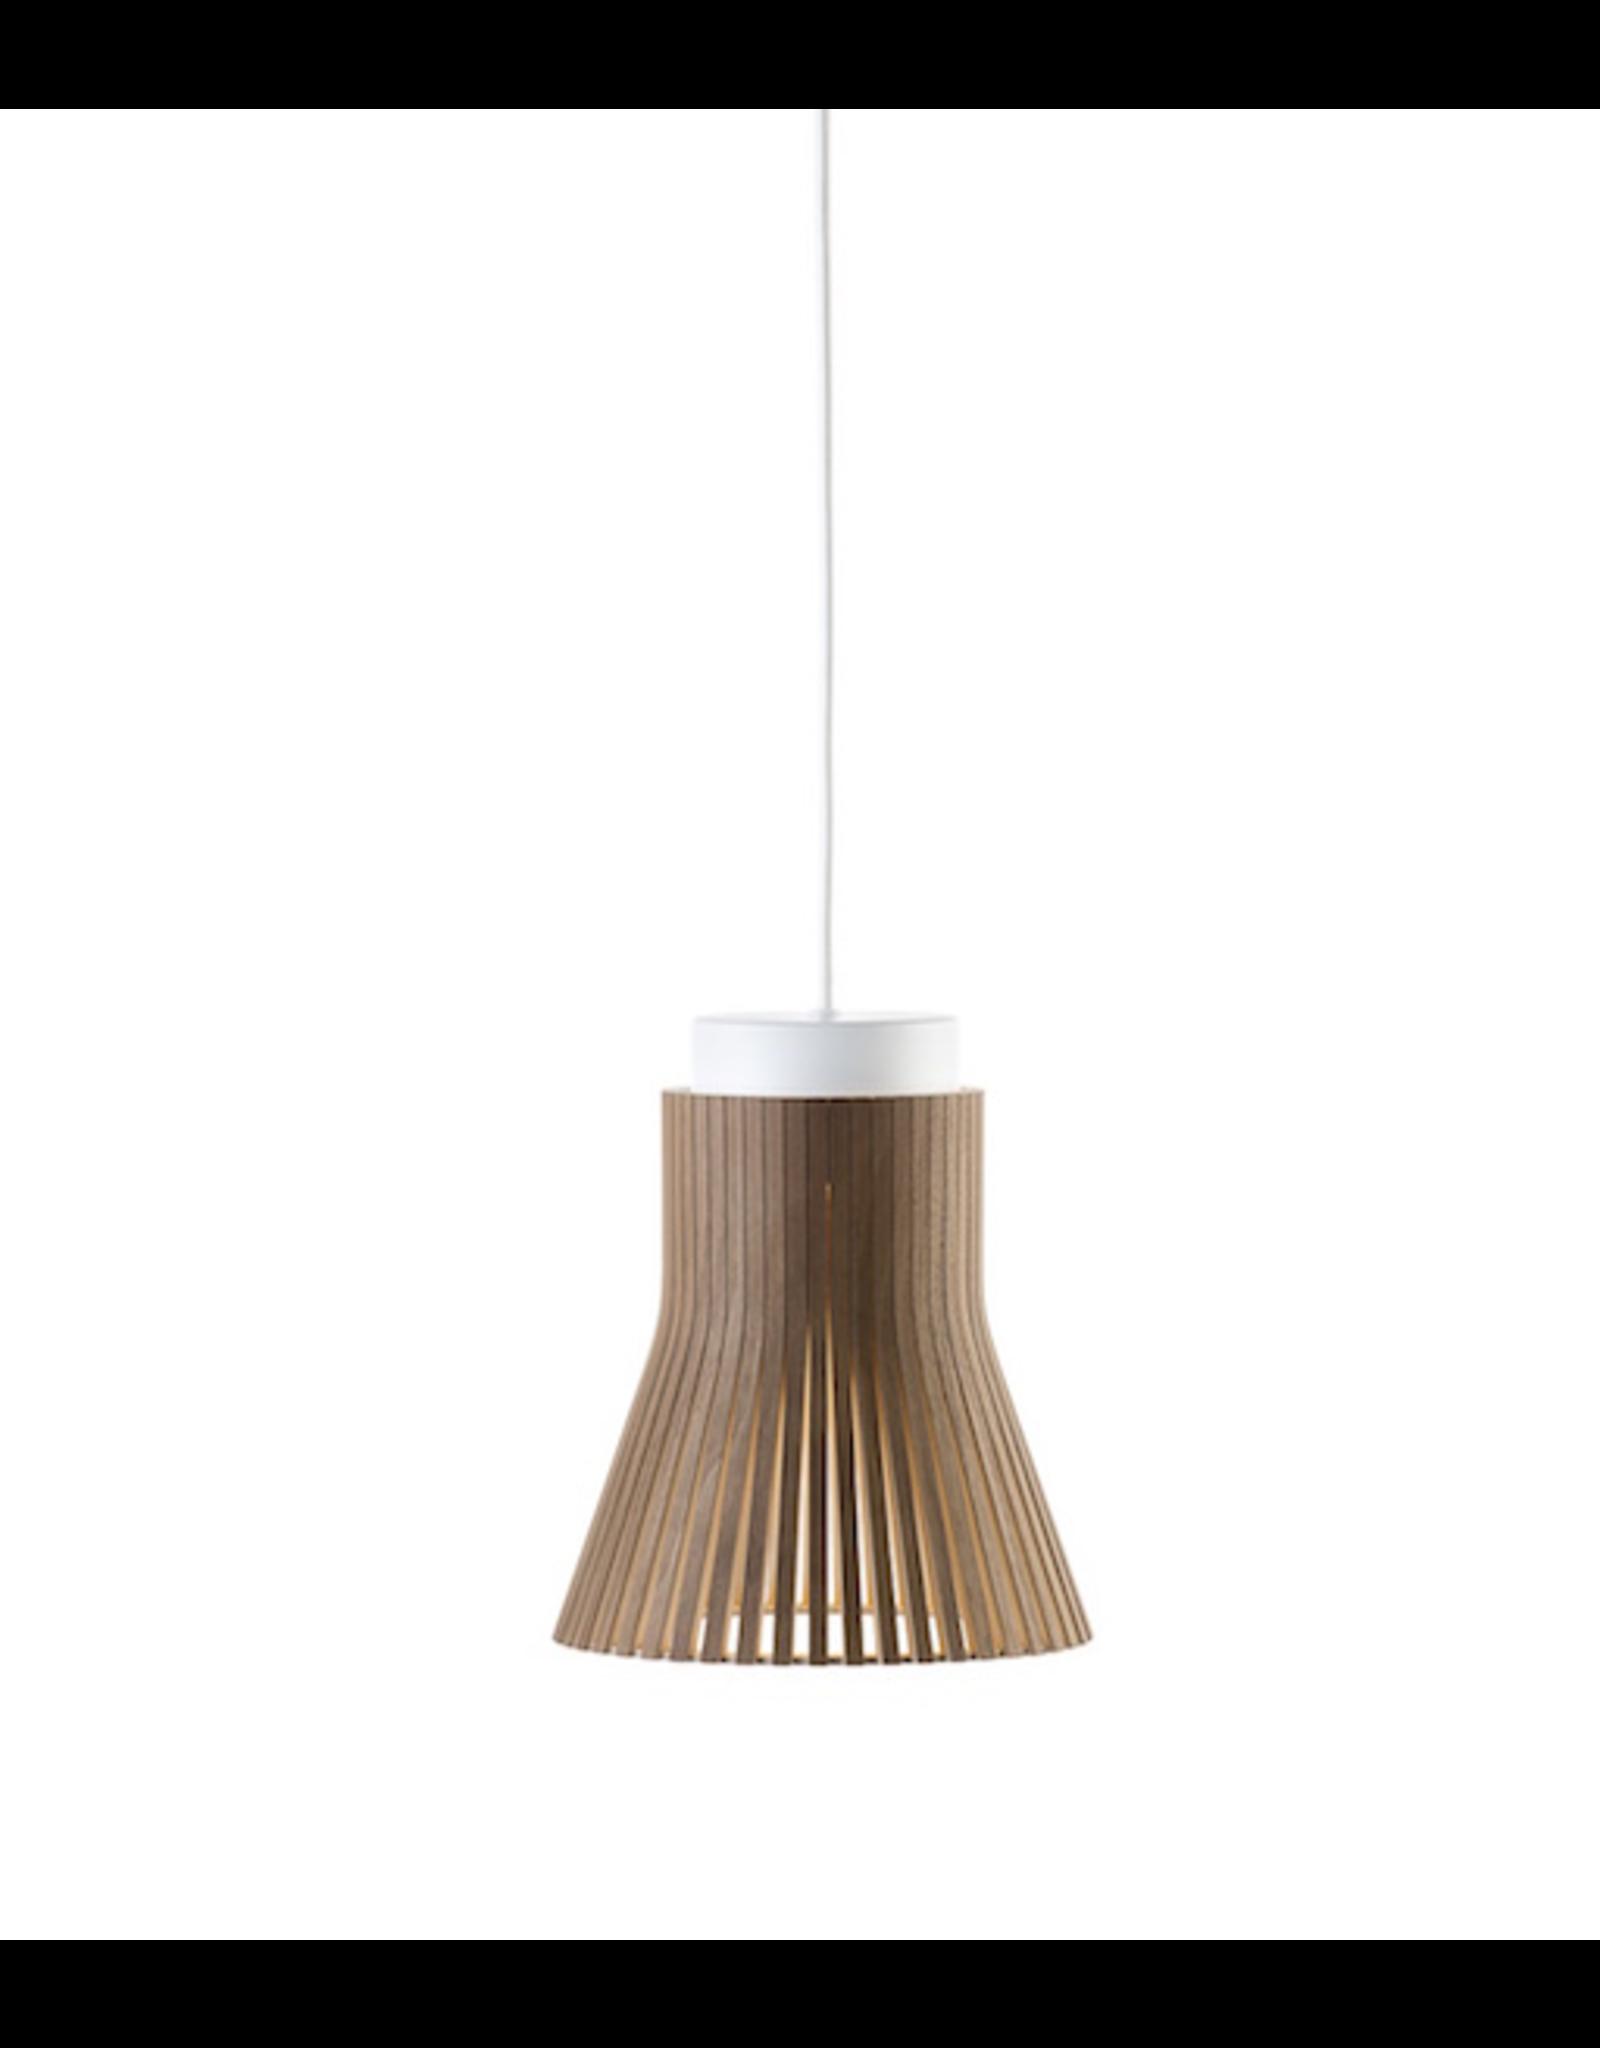 SECTO DESIGN 4600 PETITE PENDANT LAMP IN WALNUT VENEER